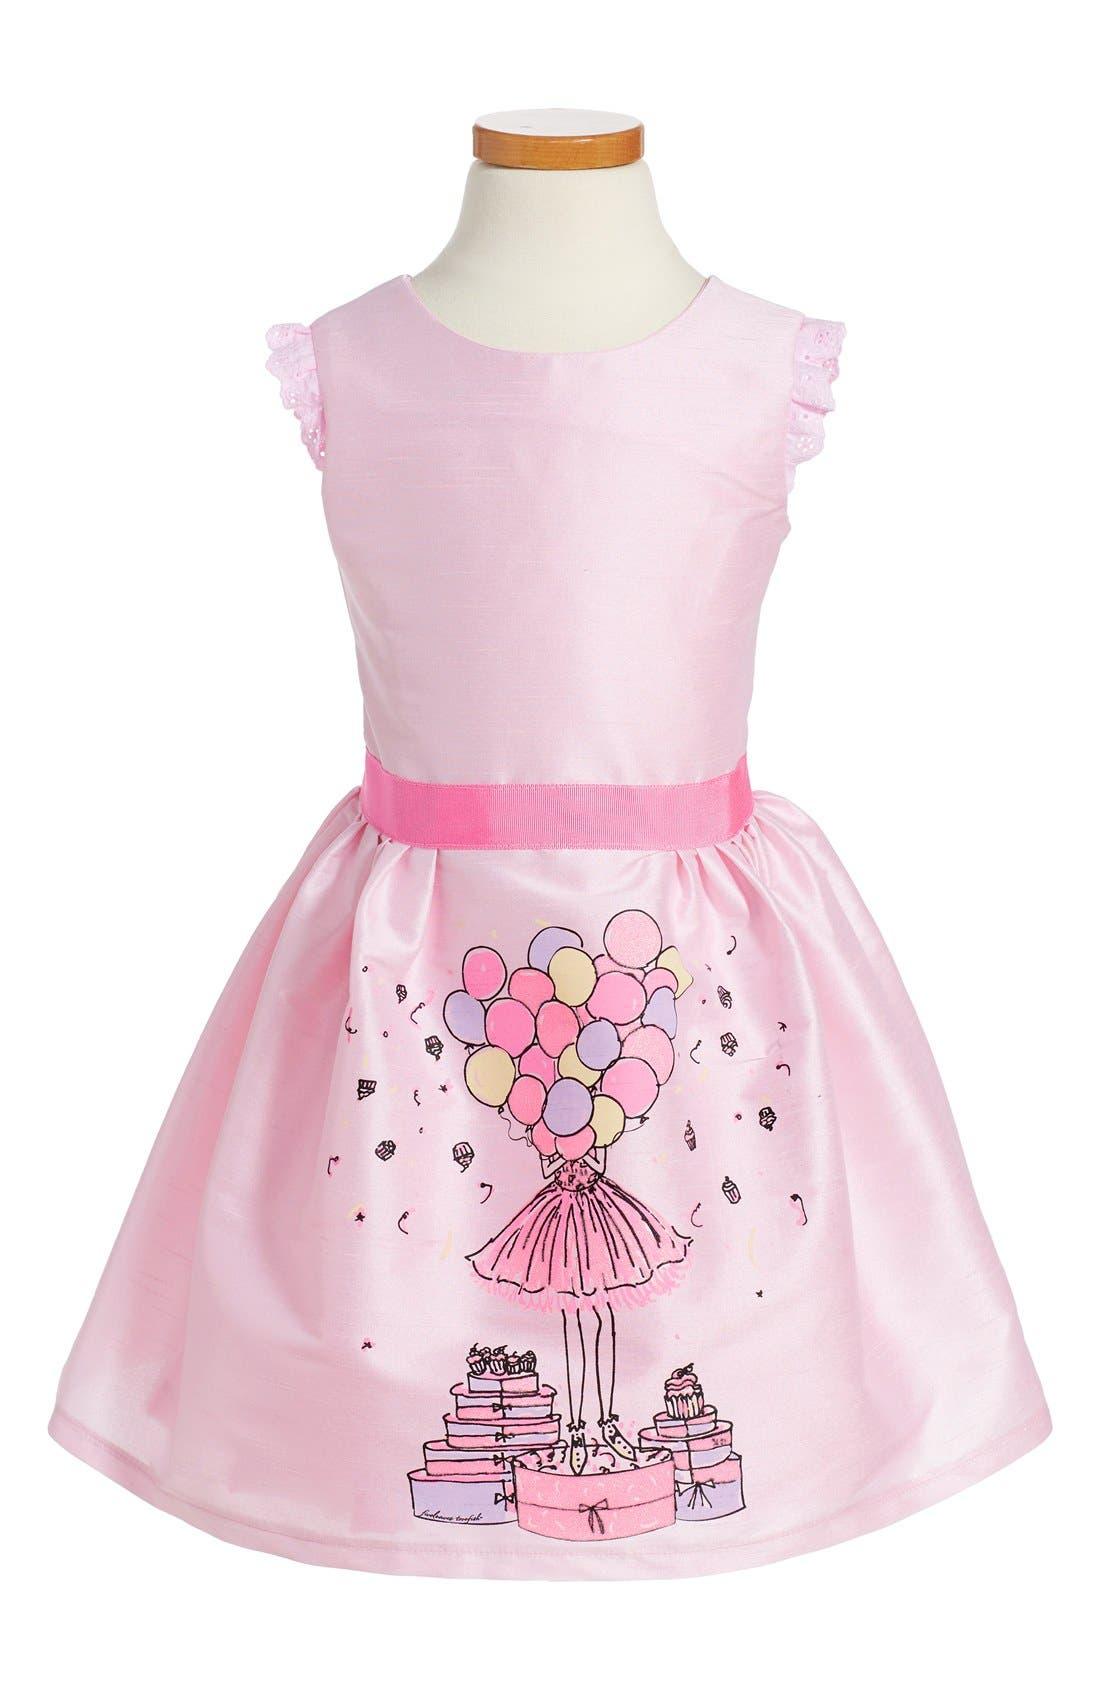 Toddler Birthday Balloon Dress